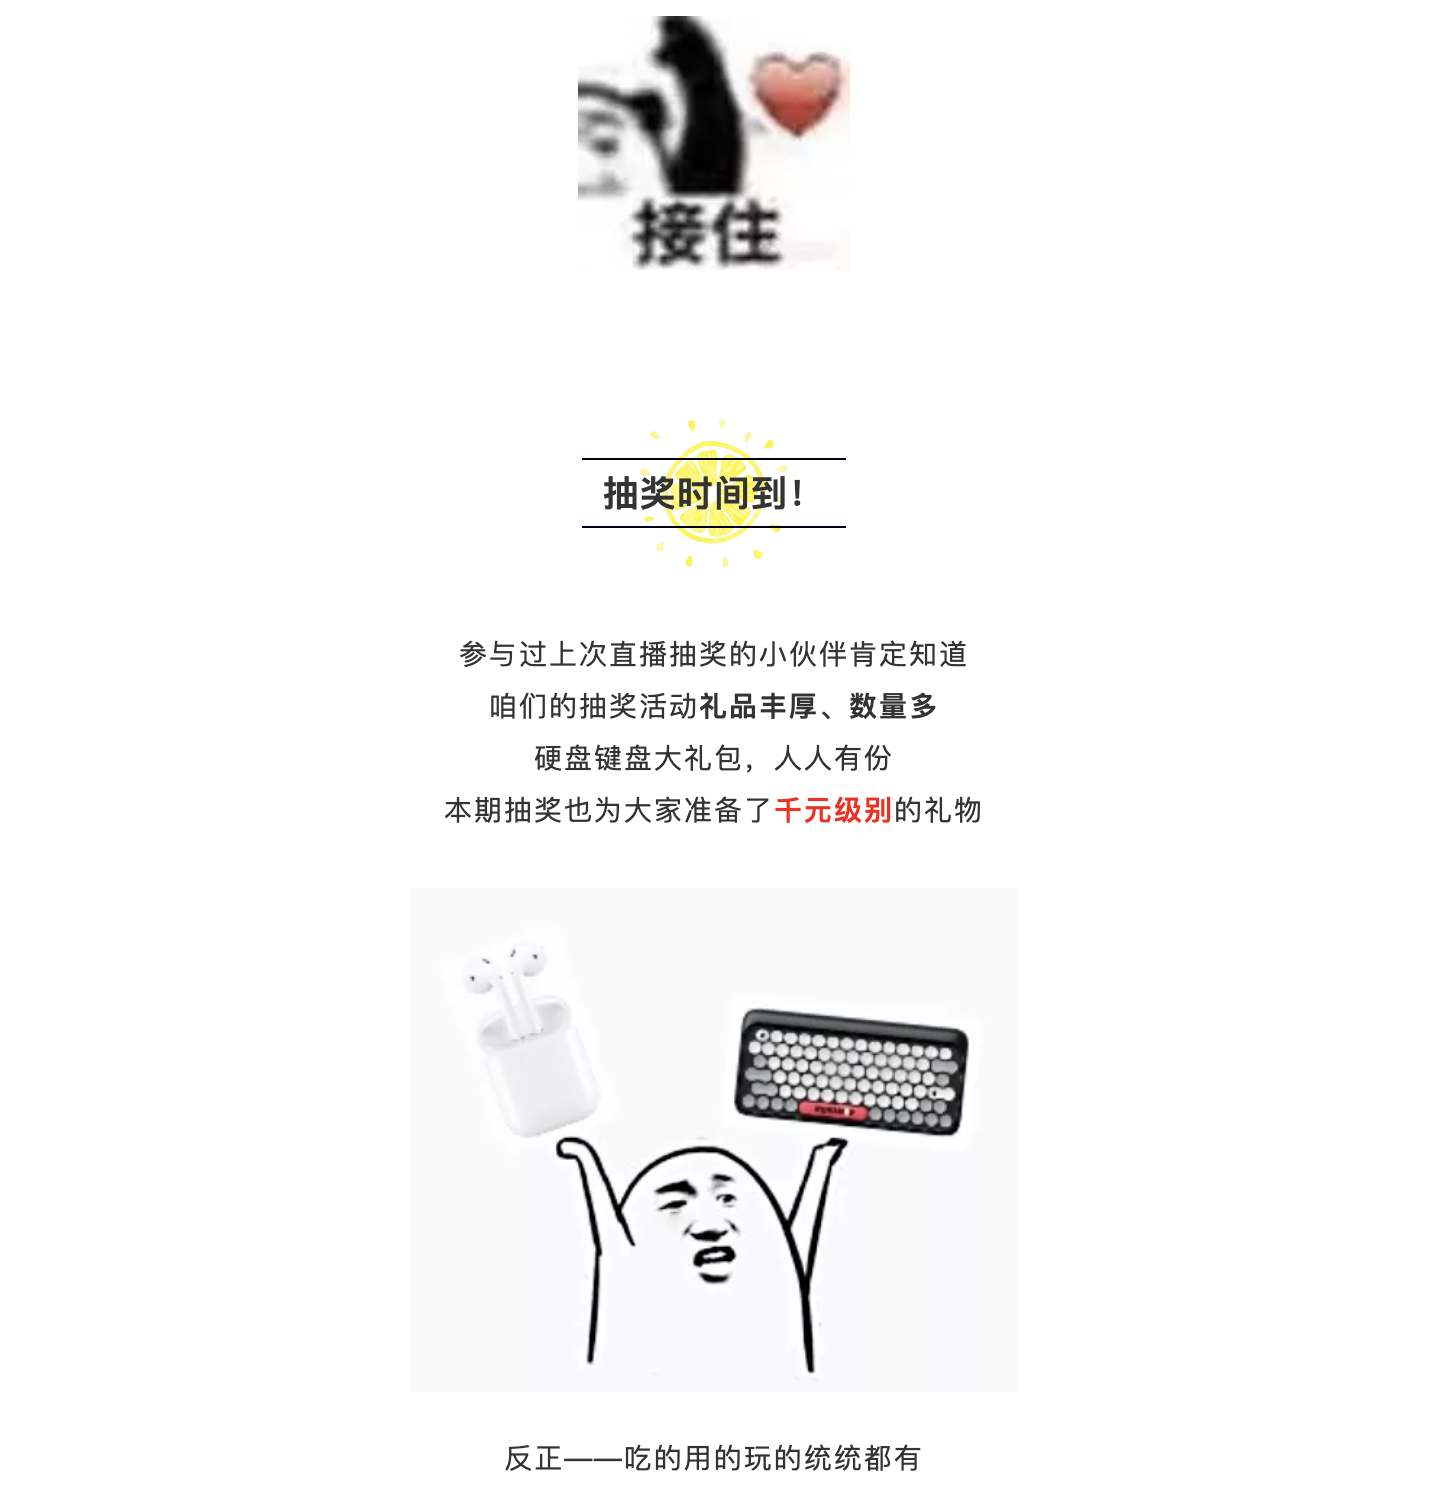 https://momo-mmsrc.oss-cn-hangzhou.aliyuncs.com/img-b8789c12-6c31-36fe-be50-ada81d3d3632.png